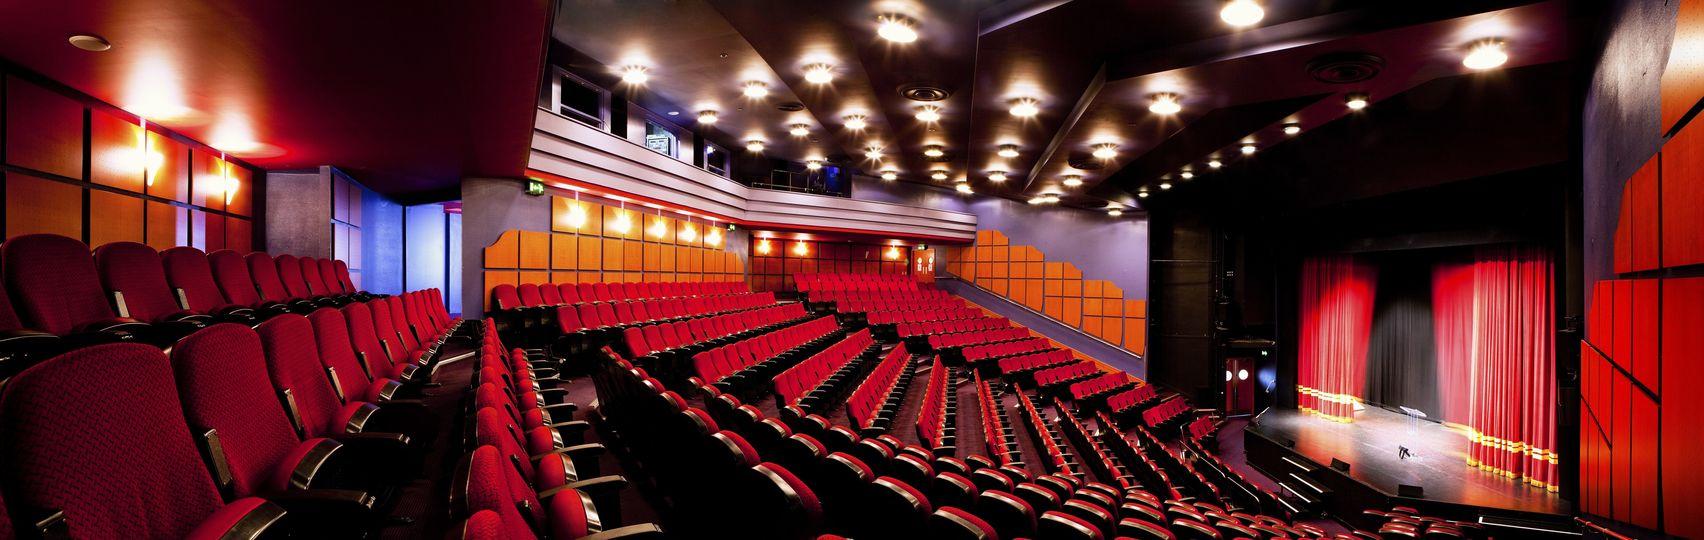 Shaw Theatre, 100-110 Euston Rd, Kings Cross, London